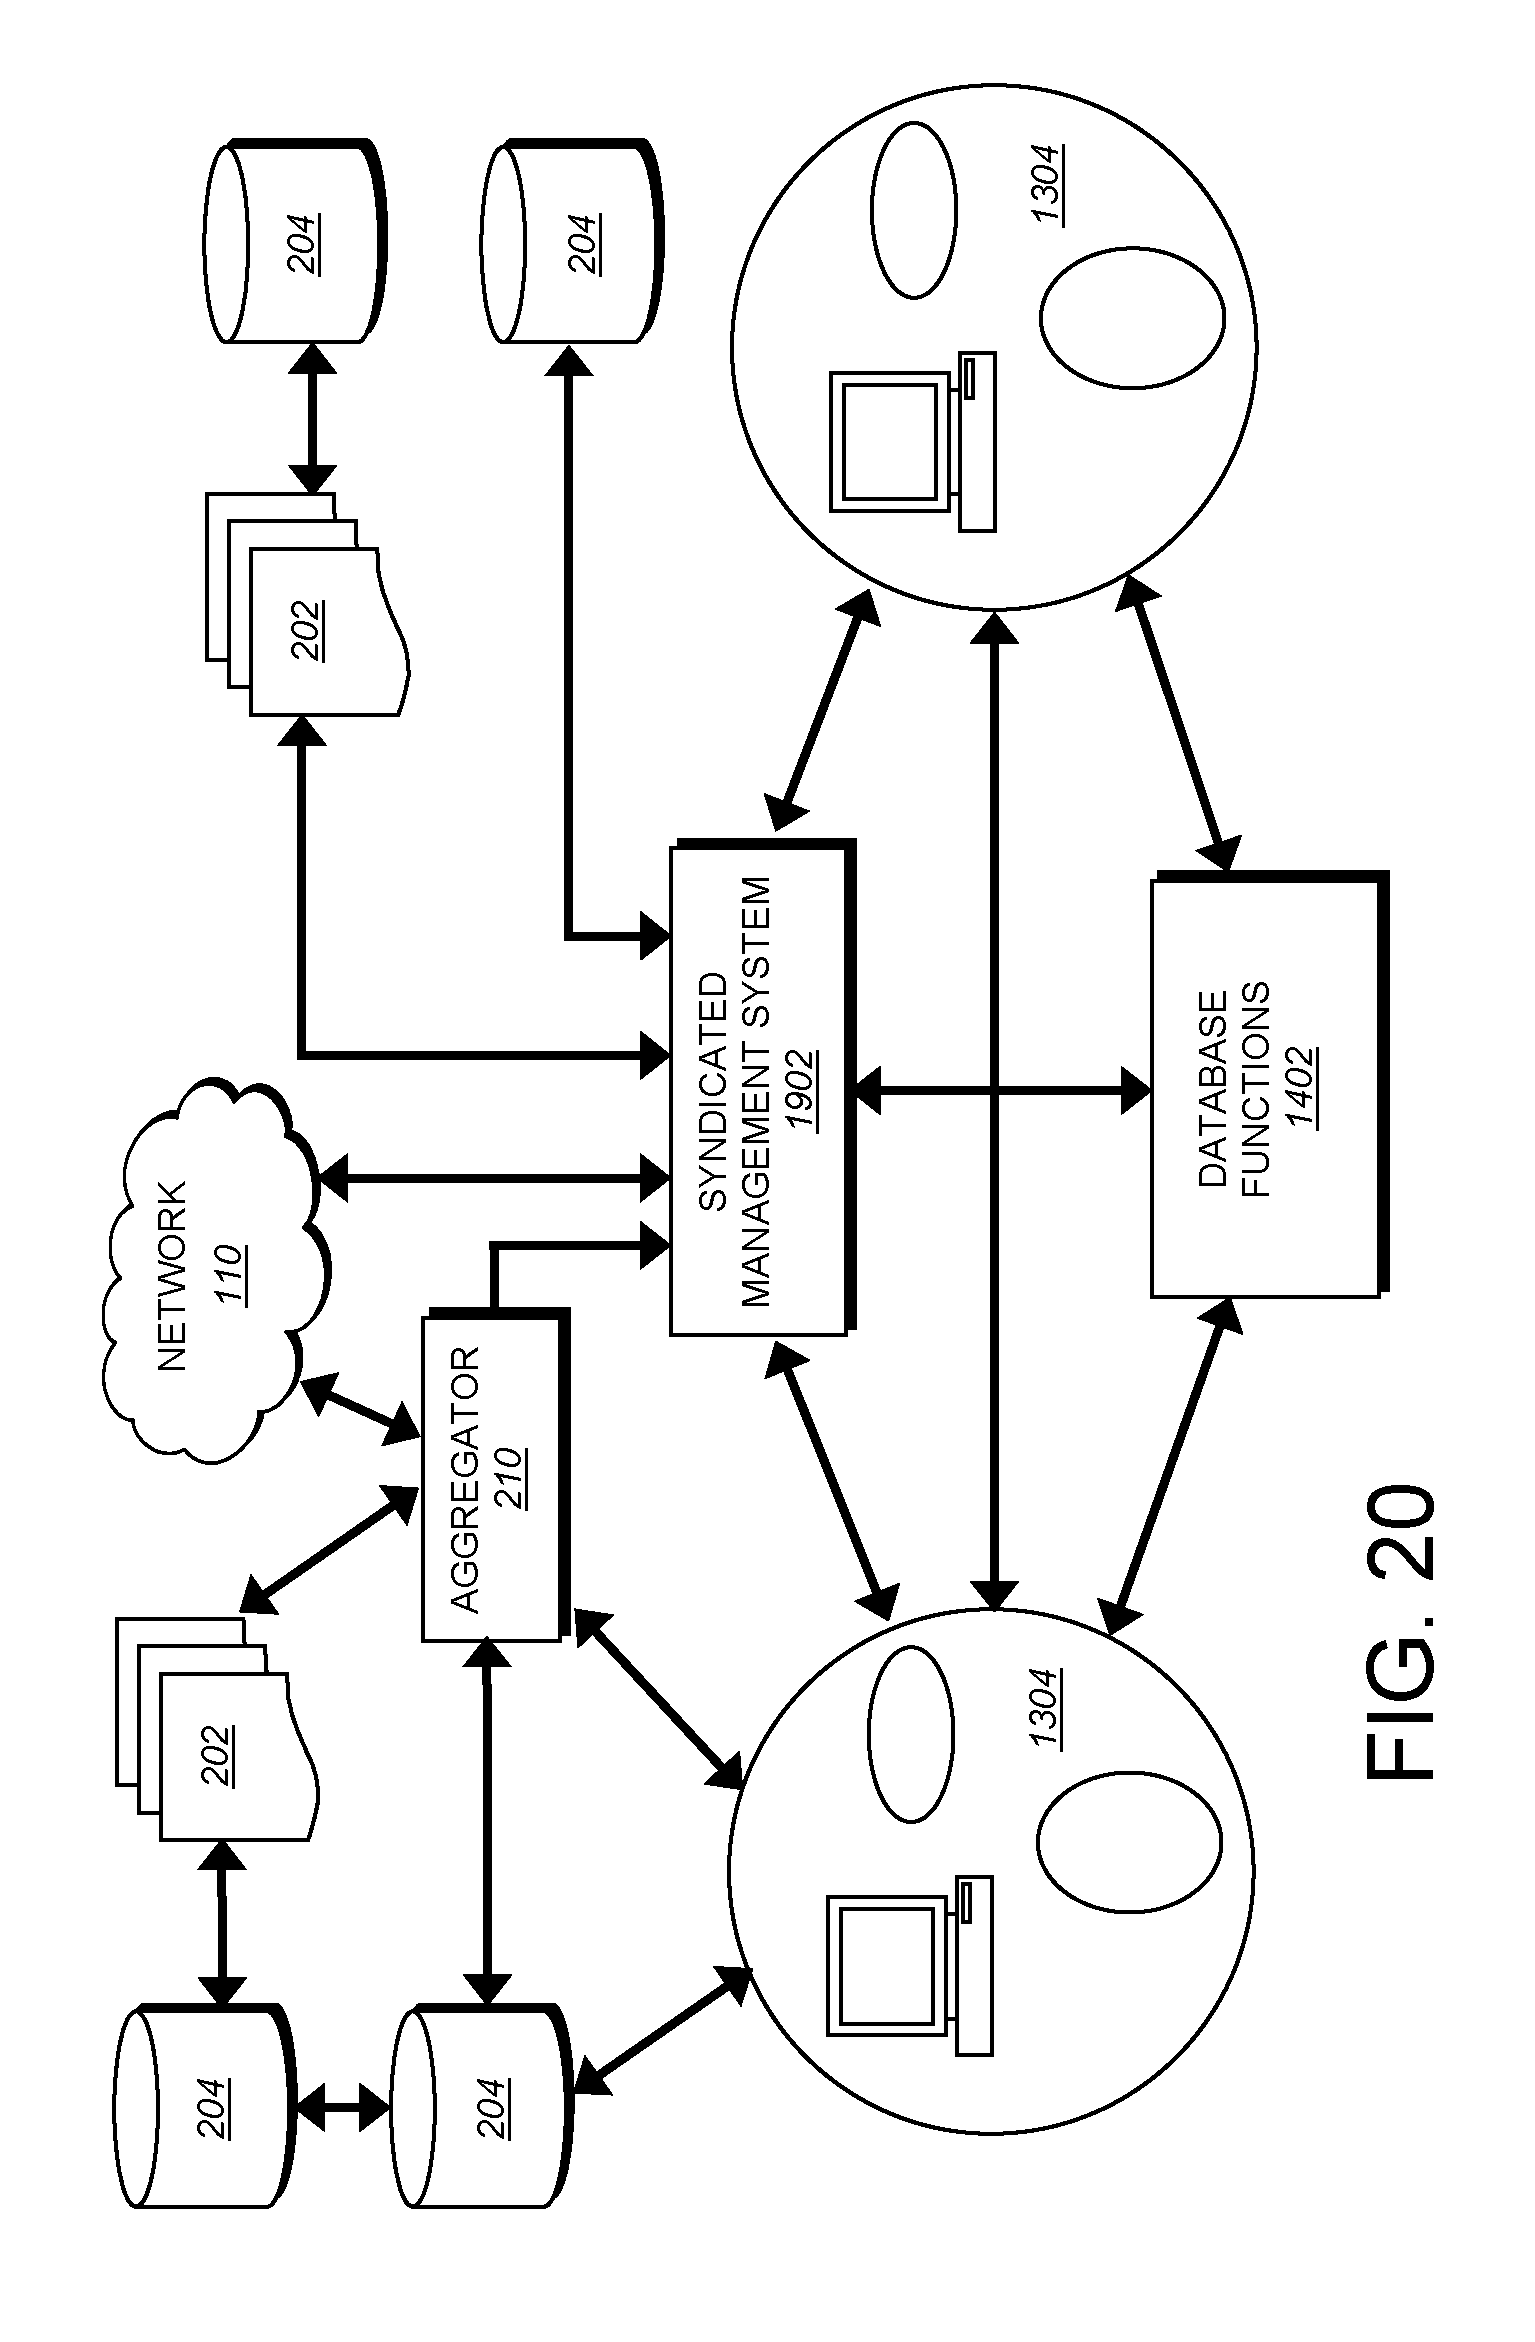 Patent US 8,768,731 B2